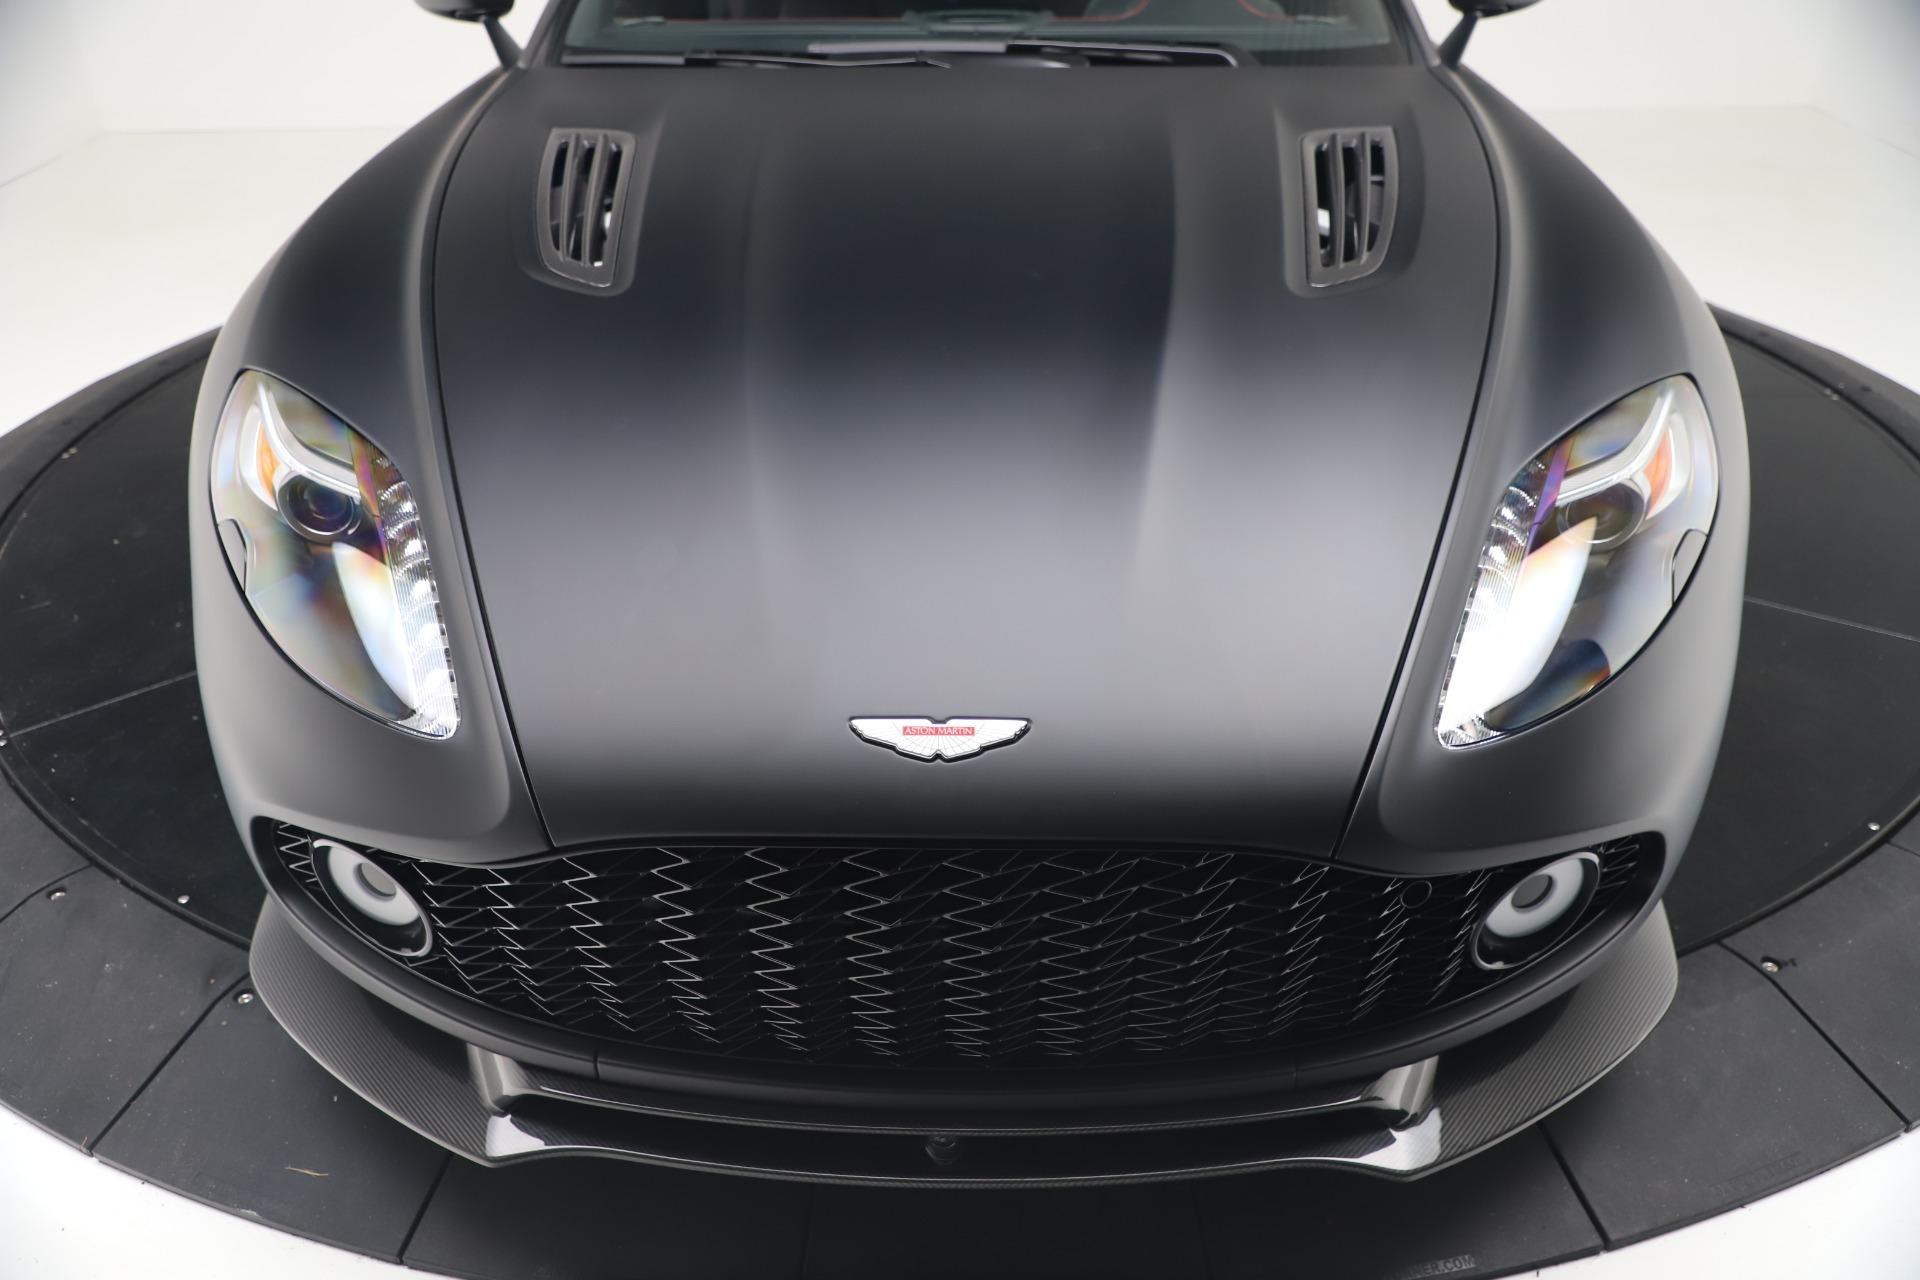 New 2019 Aston Martin Vanquish Shooting Brake For Sale In Westport, CT 3512_p21